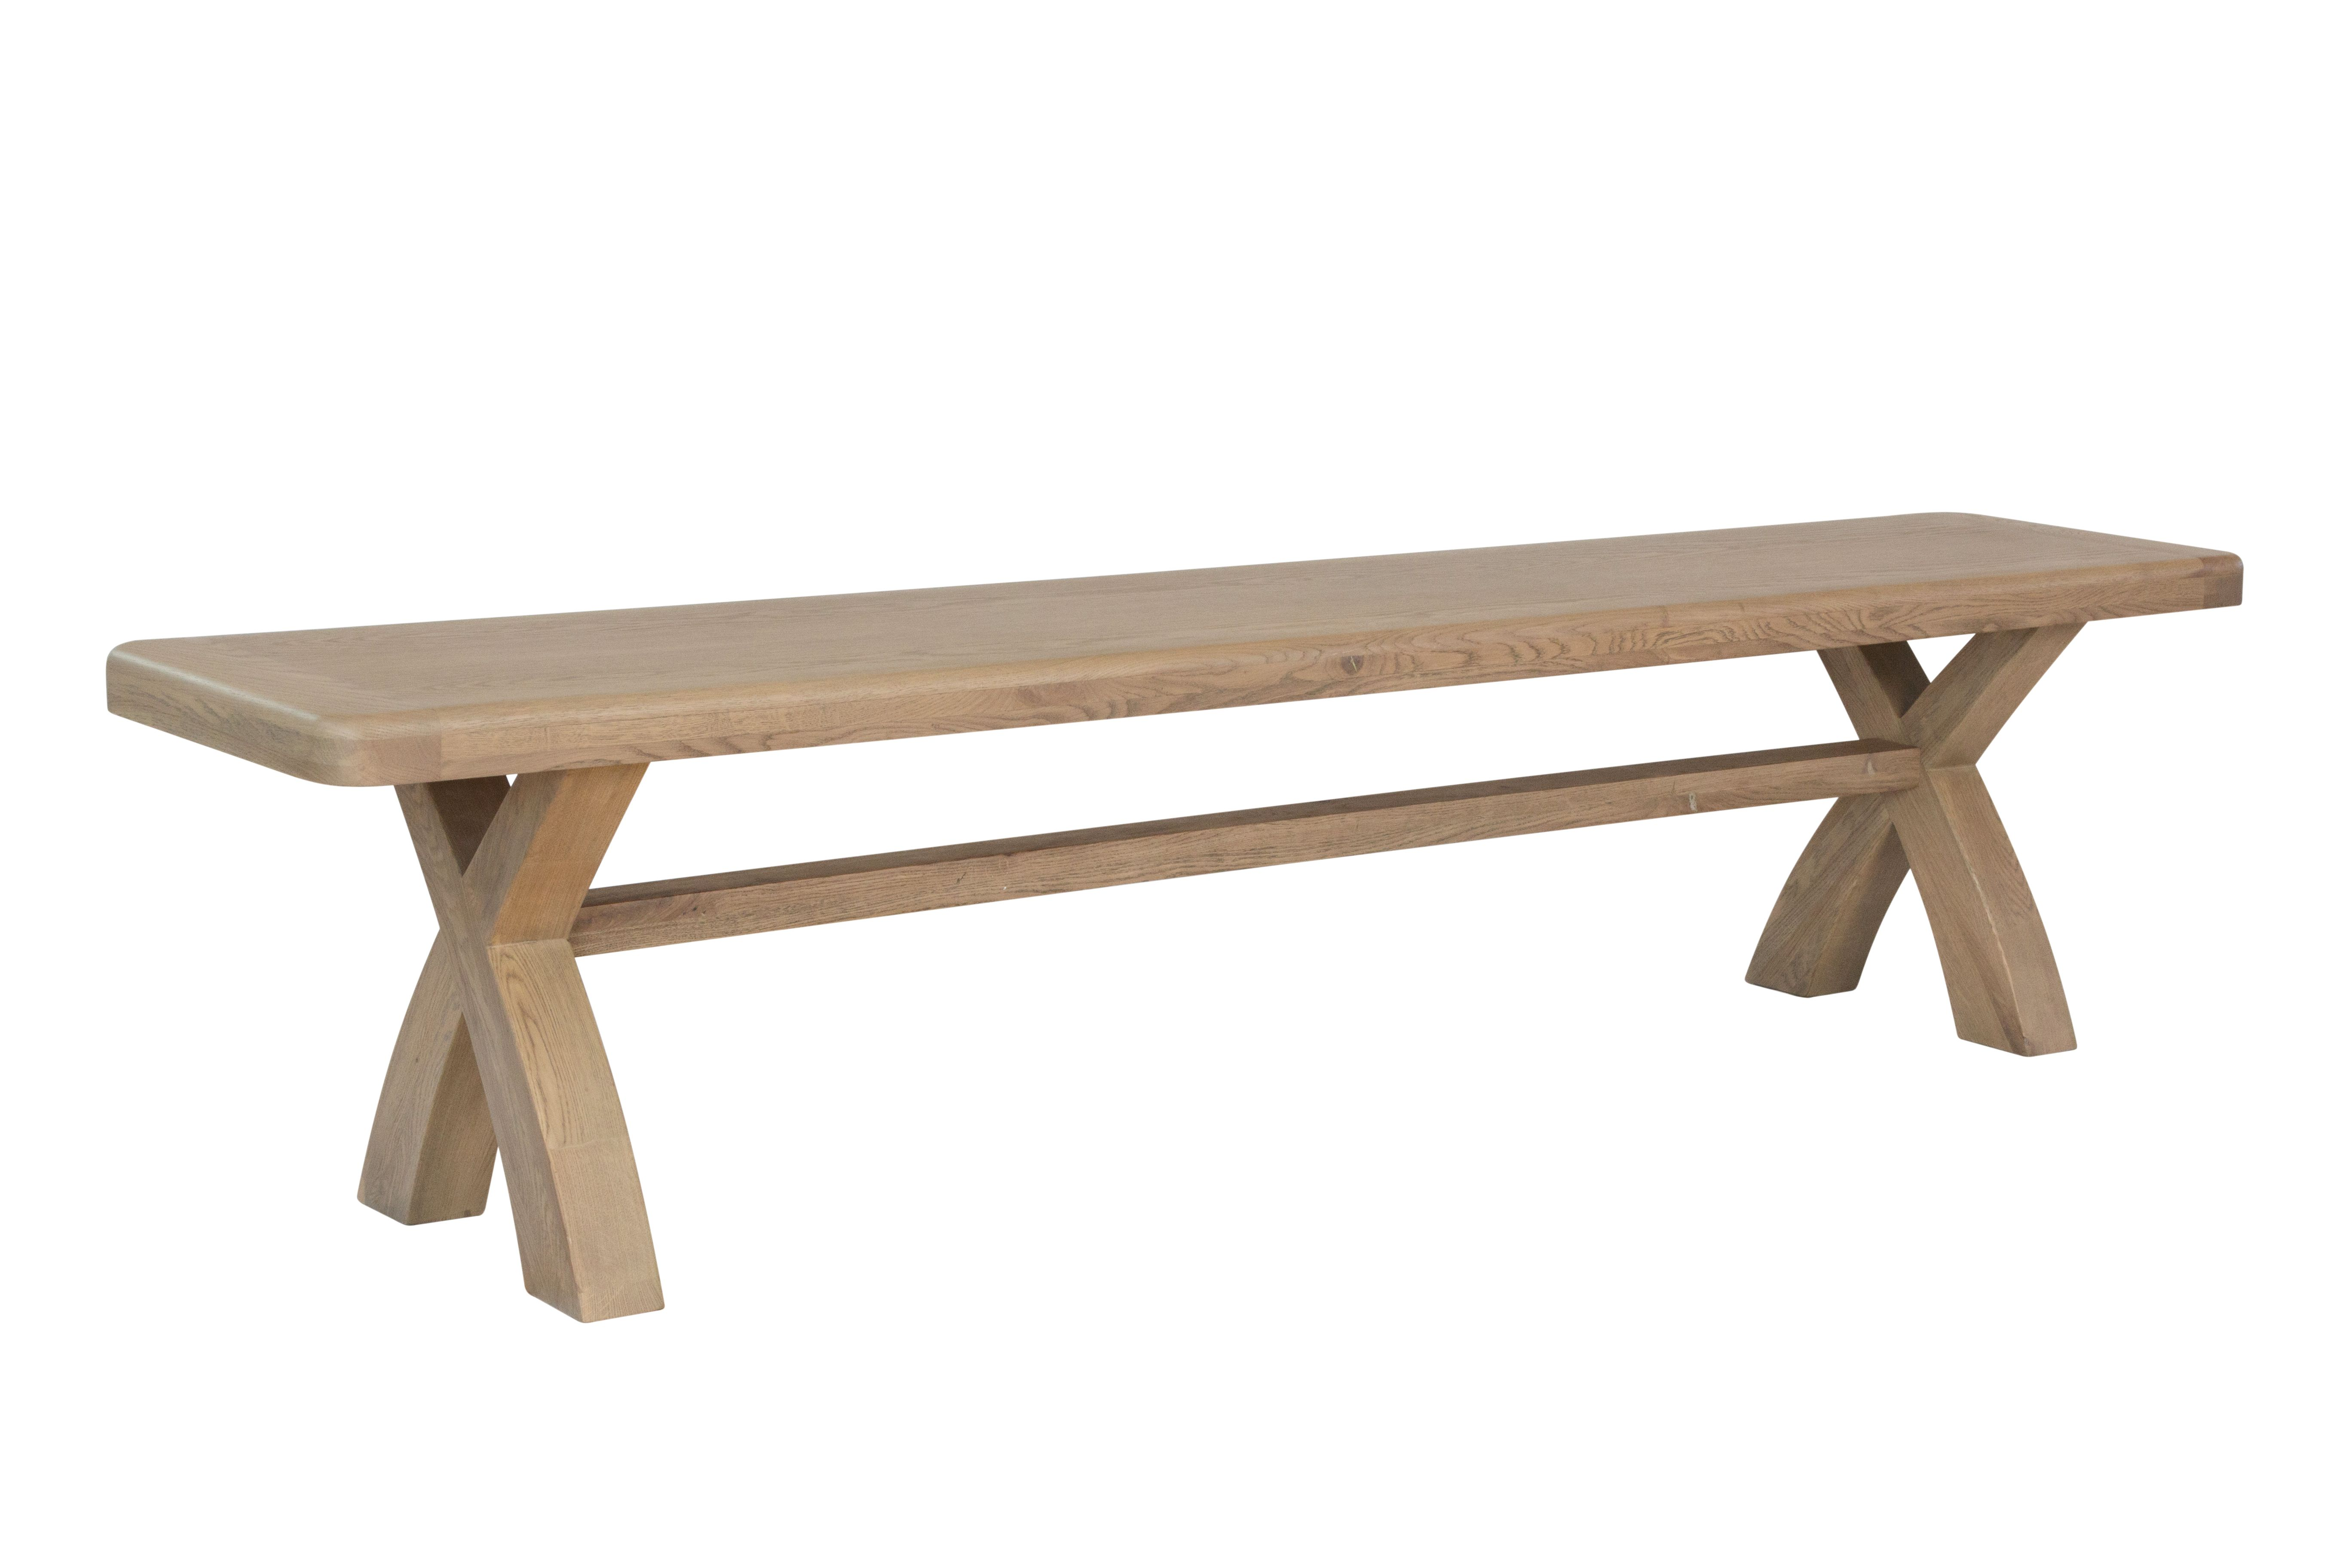 HOULGATE OAK 2m Cross Leg Dining Bench